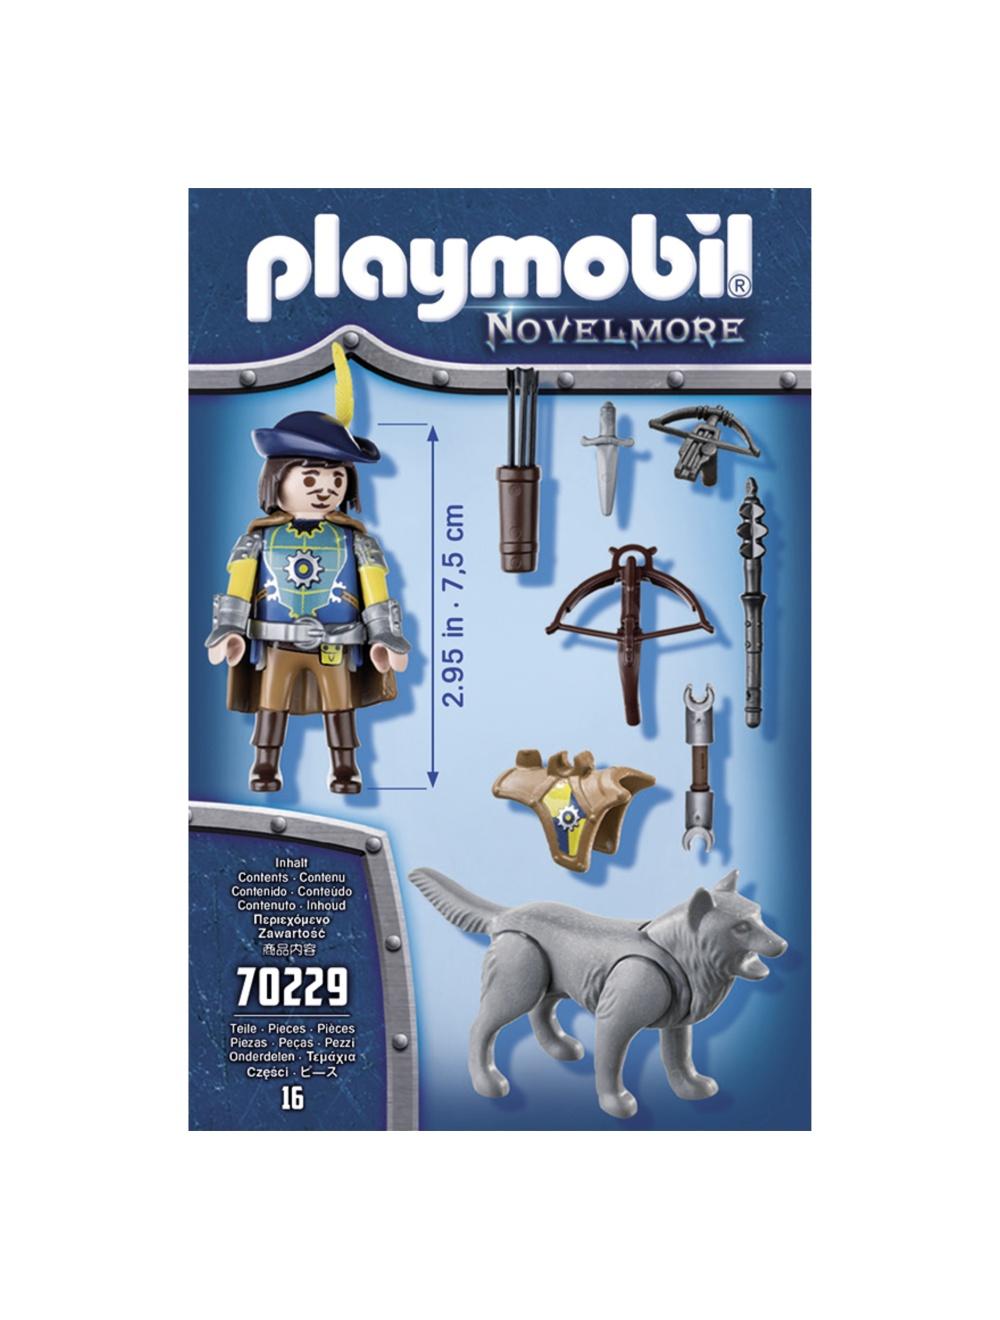 Cavaler si lup playmobil novelmore - 1